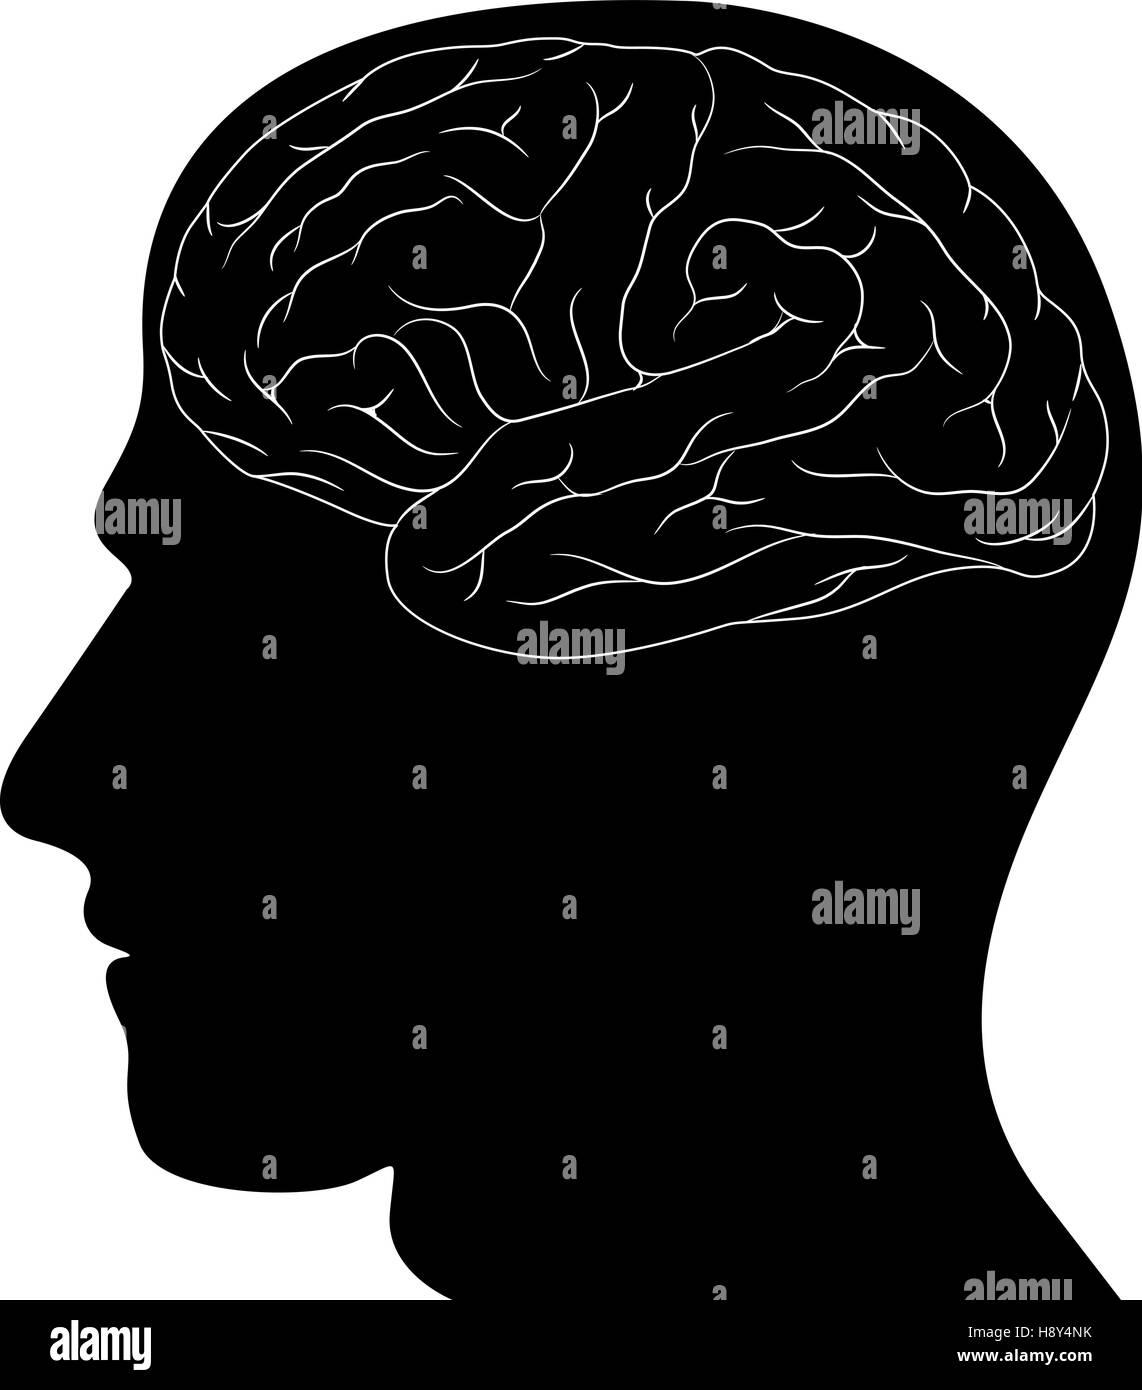 Head and Brain - Stock Image